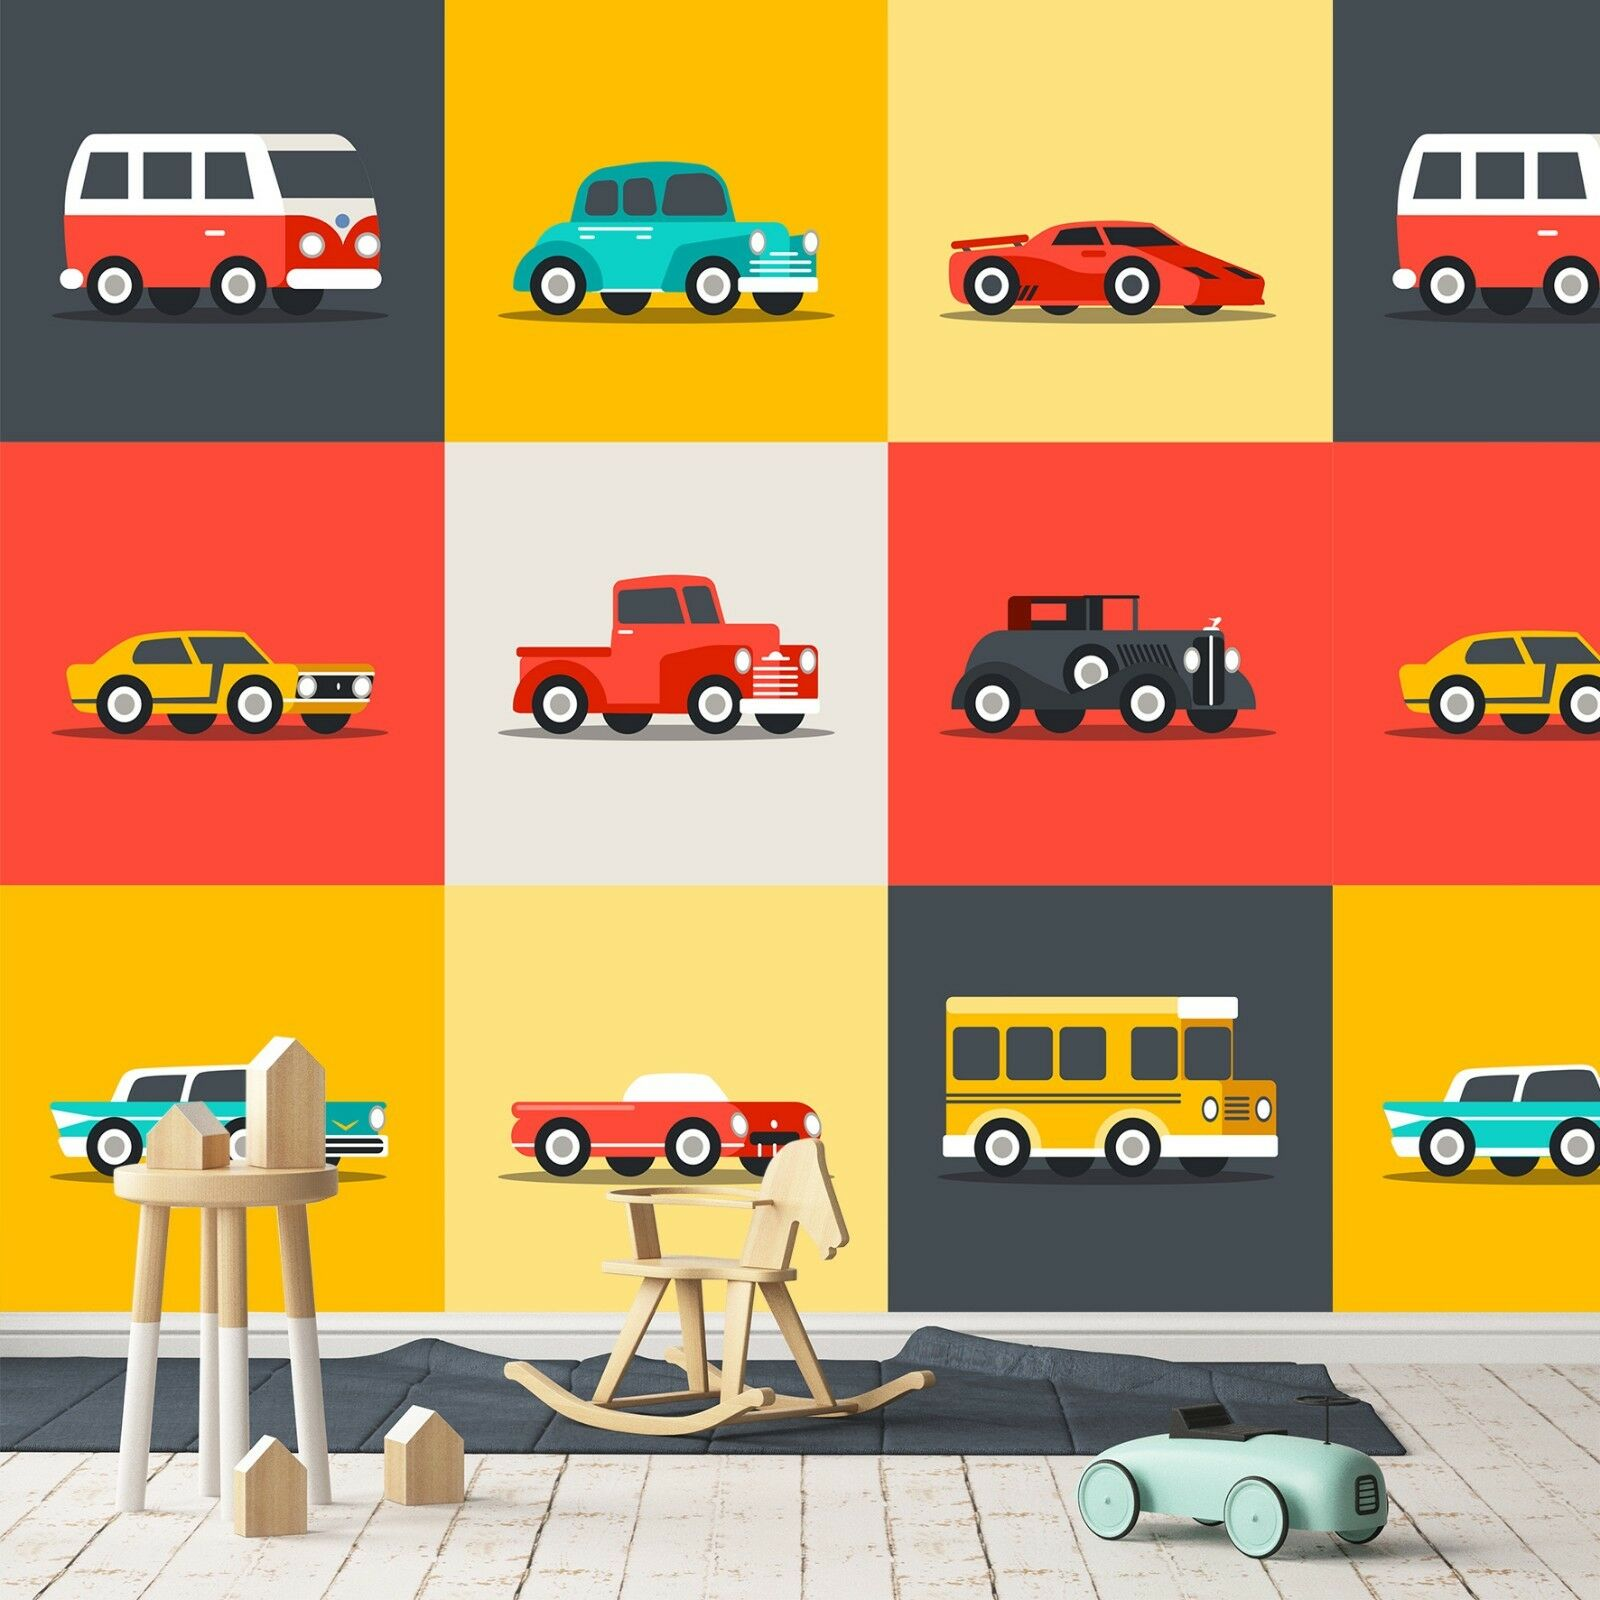 3D ROT Car 763 Wall Paper Print Wall Decal Deco Indoor Wall Murals US Summer